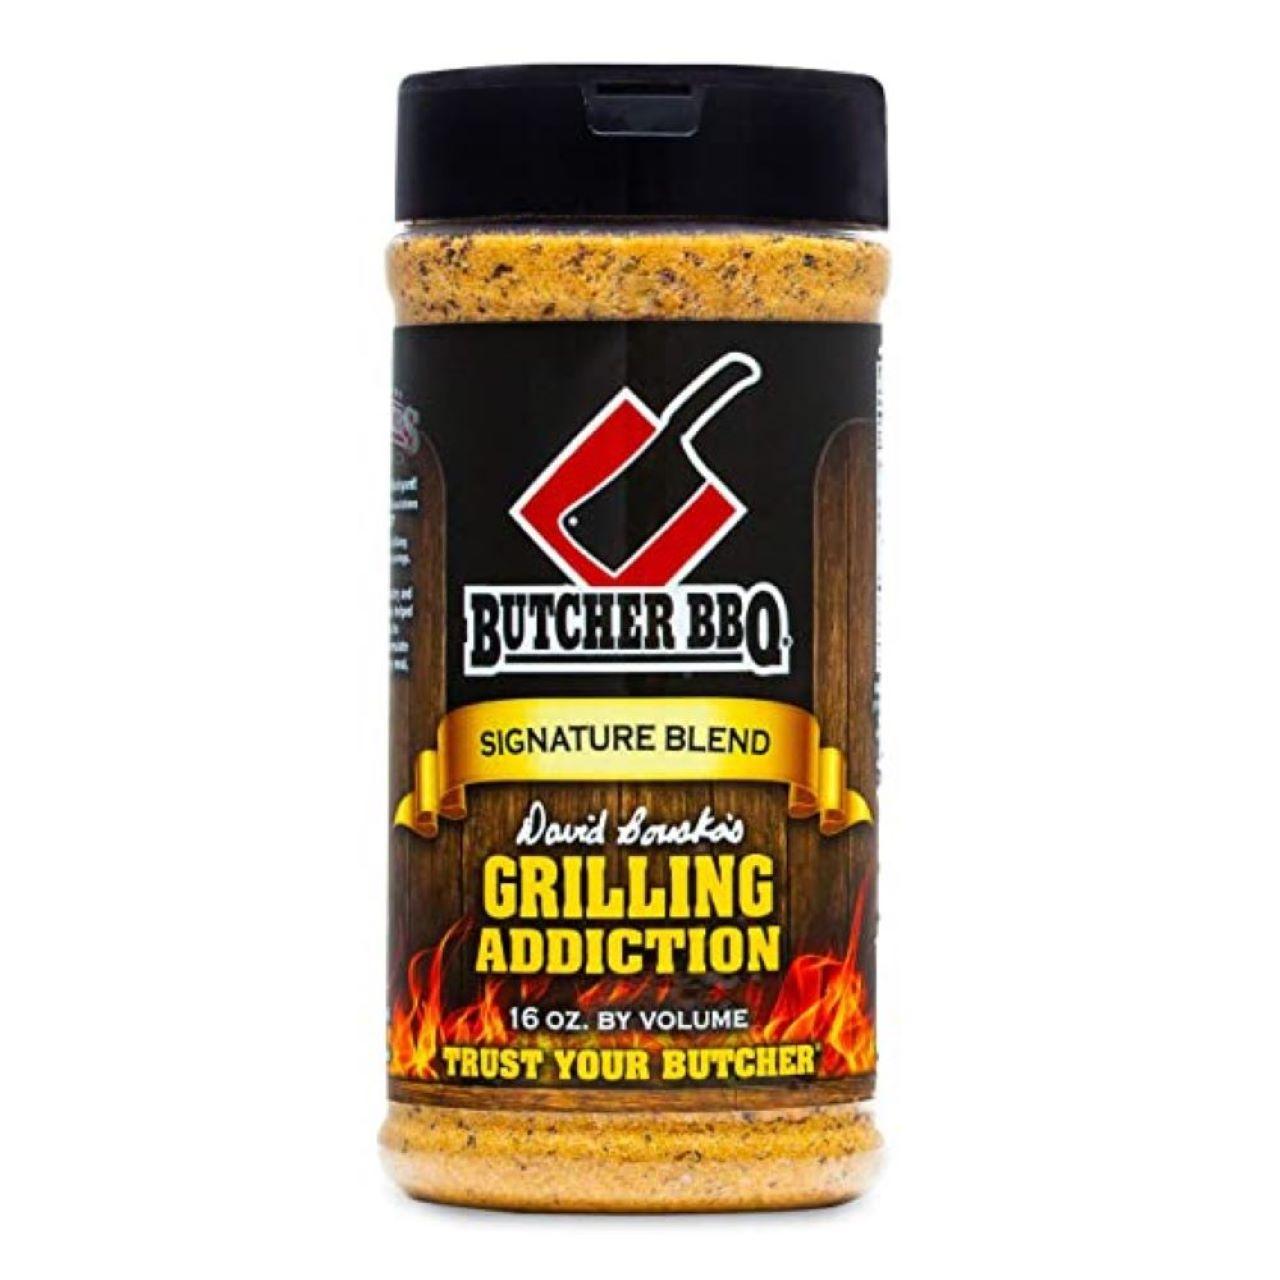 Butcher BBQ 16oz Grilling Addiction Dry Rub Seasoning